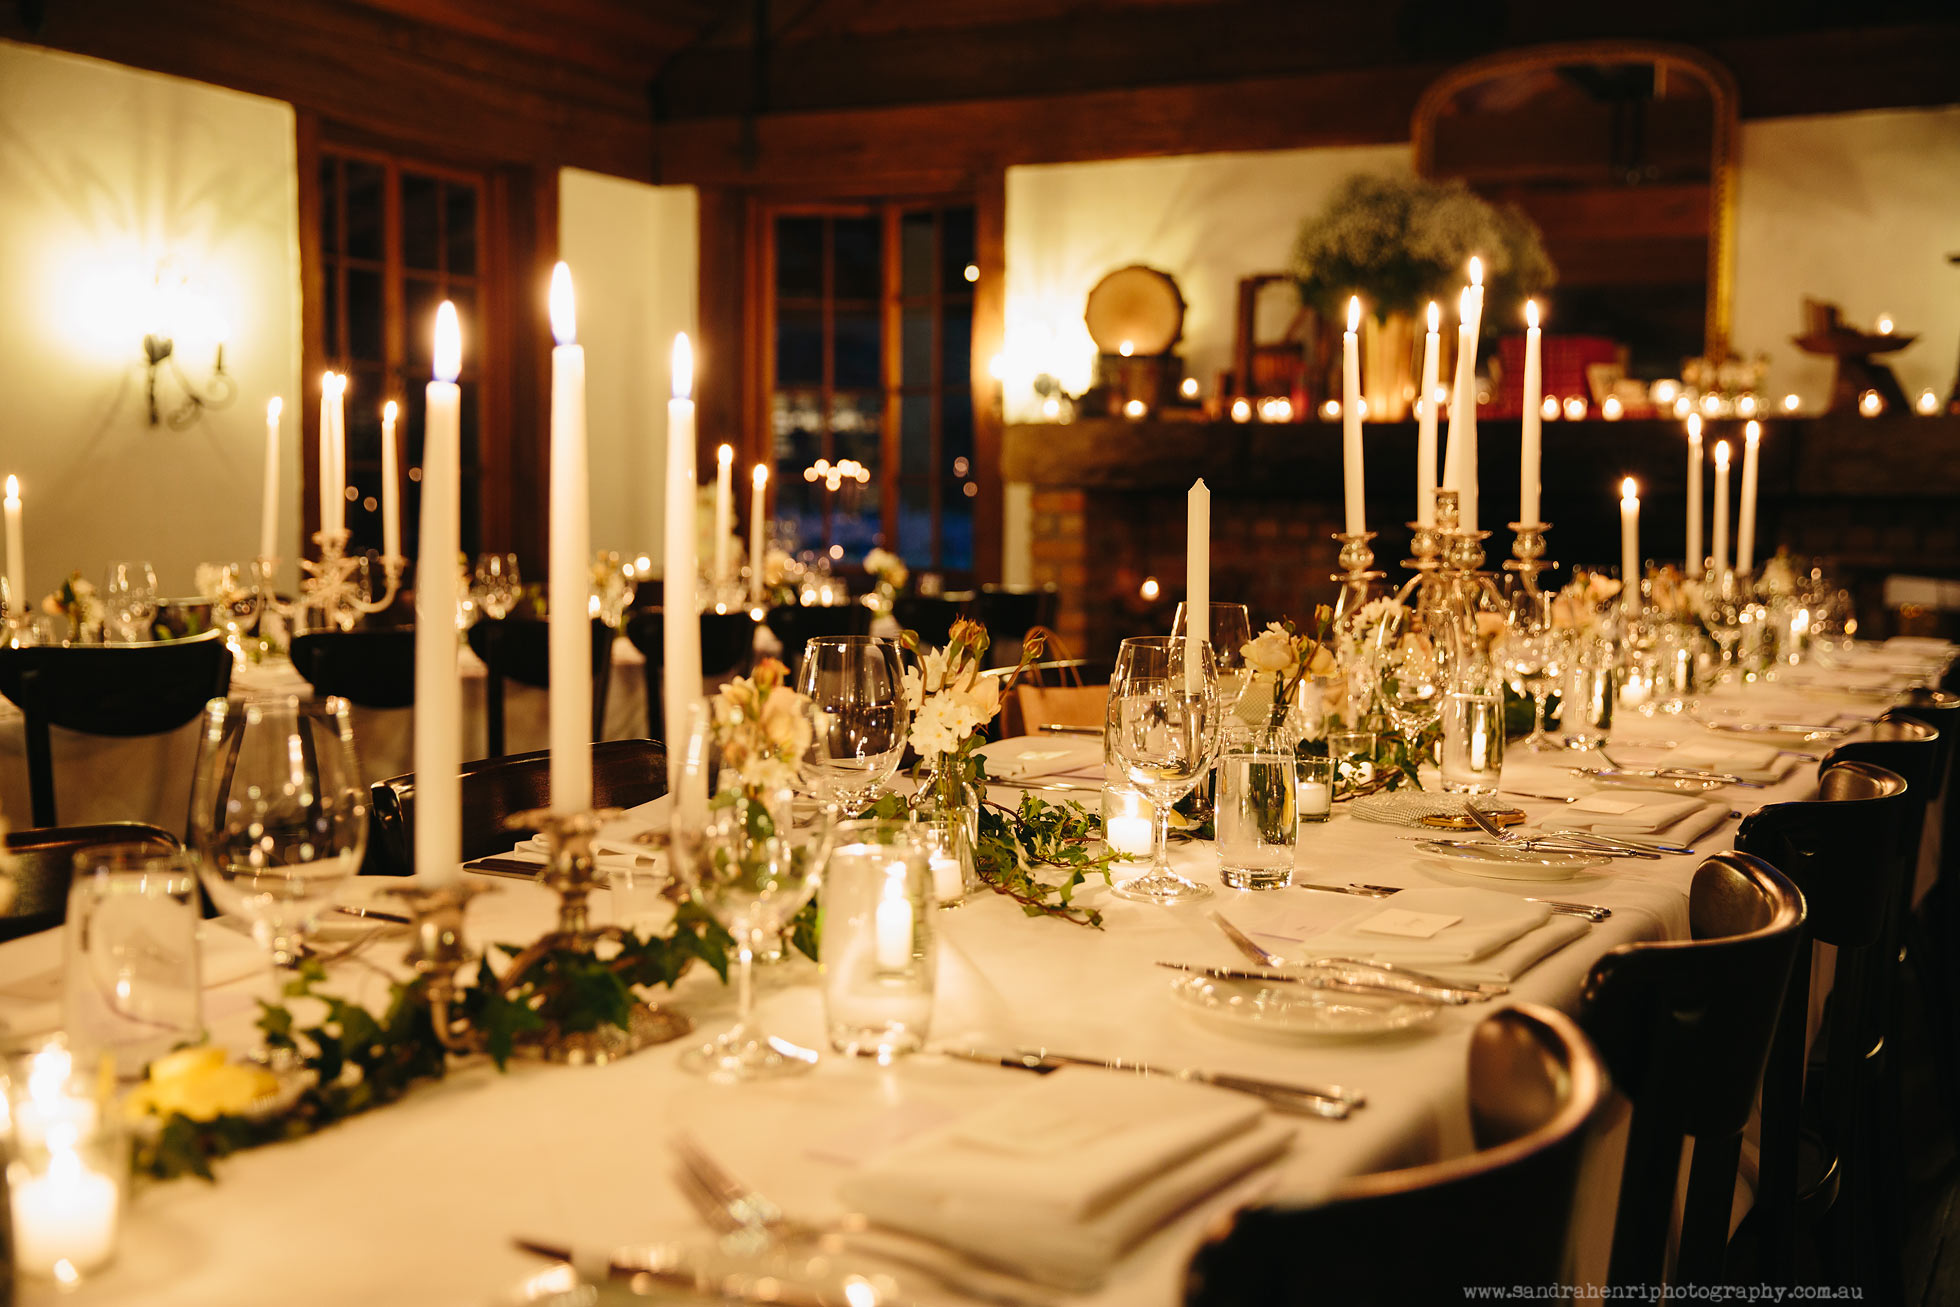 Roberts-Restaurant-garden-wedding-images-33.jpg